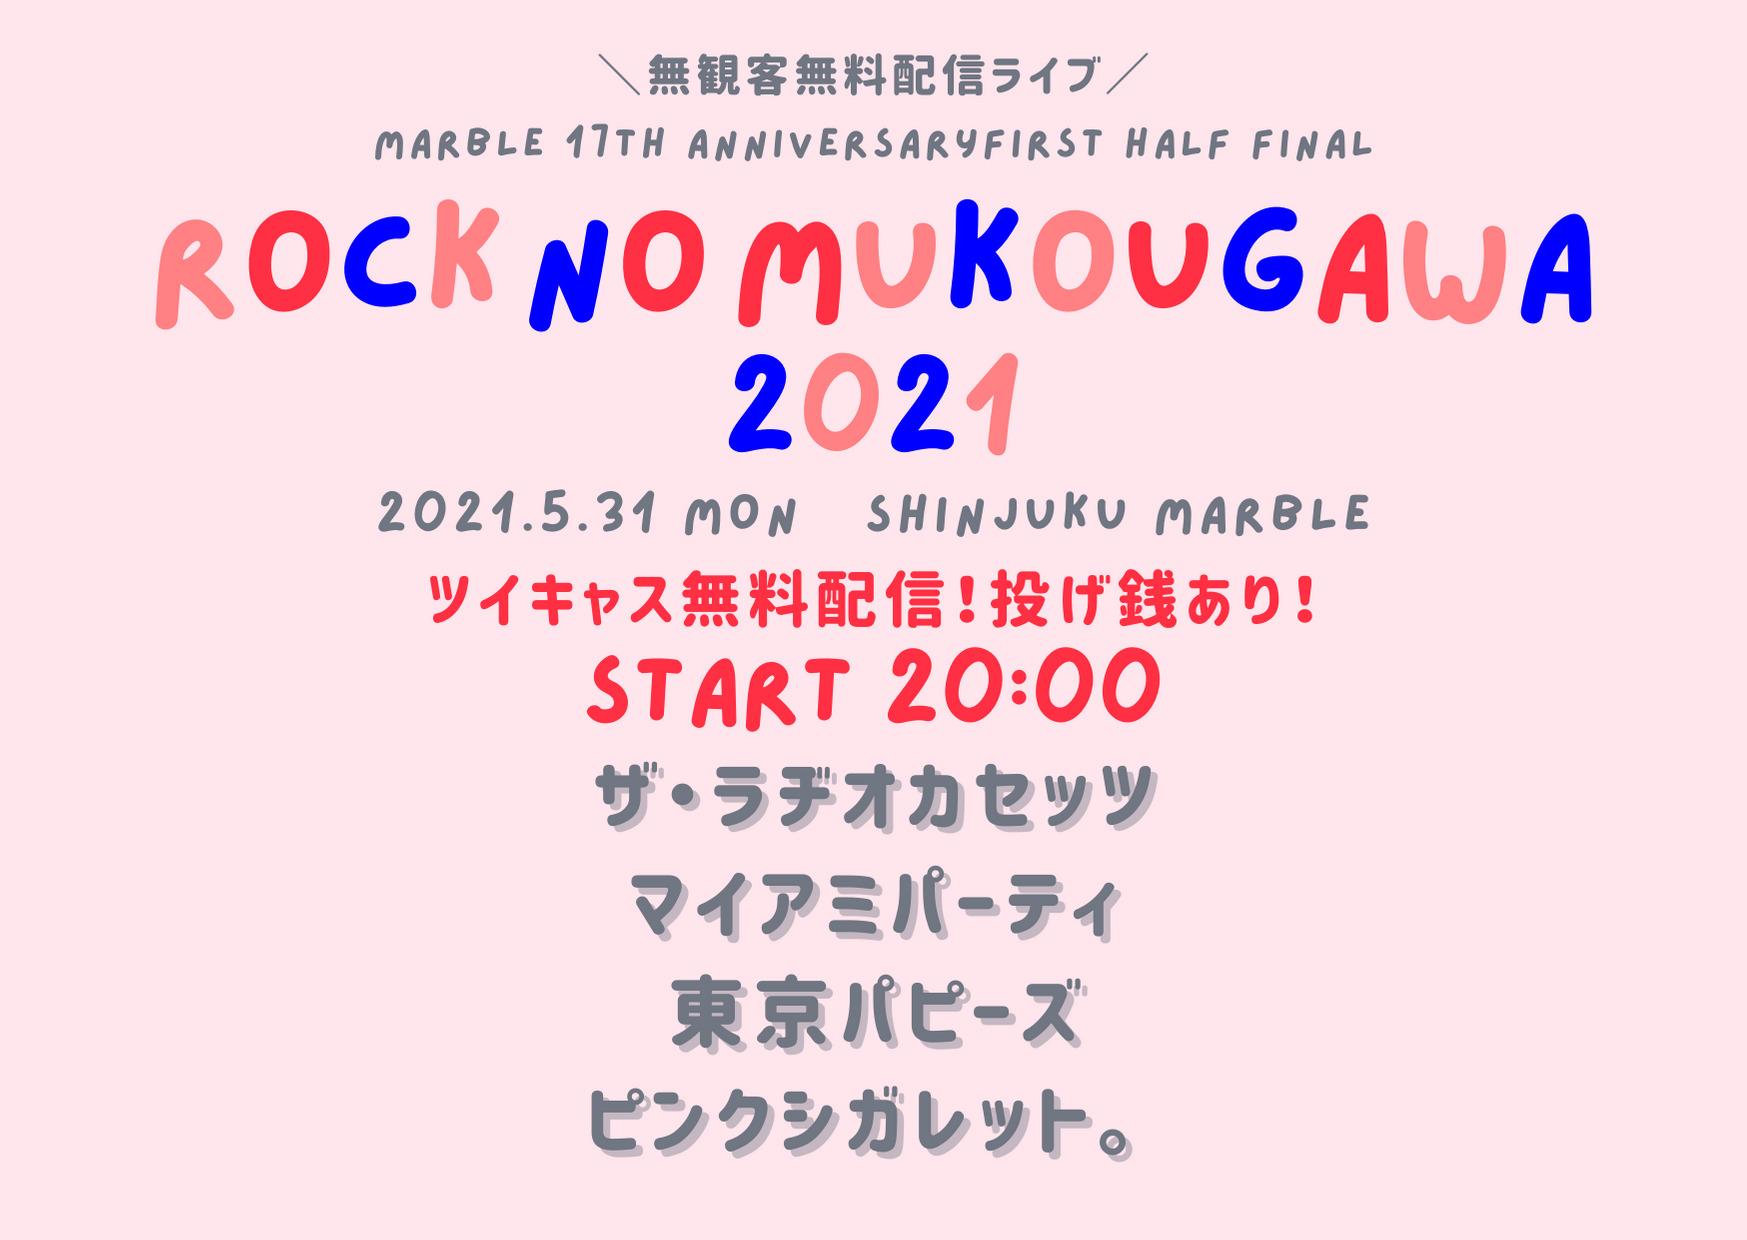 Marble 17th ANNIVERSARY FIRST HALF FINAL ROCKNOMUKOUGAWA2021